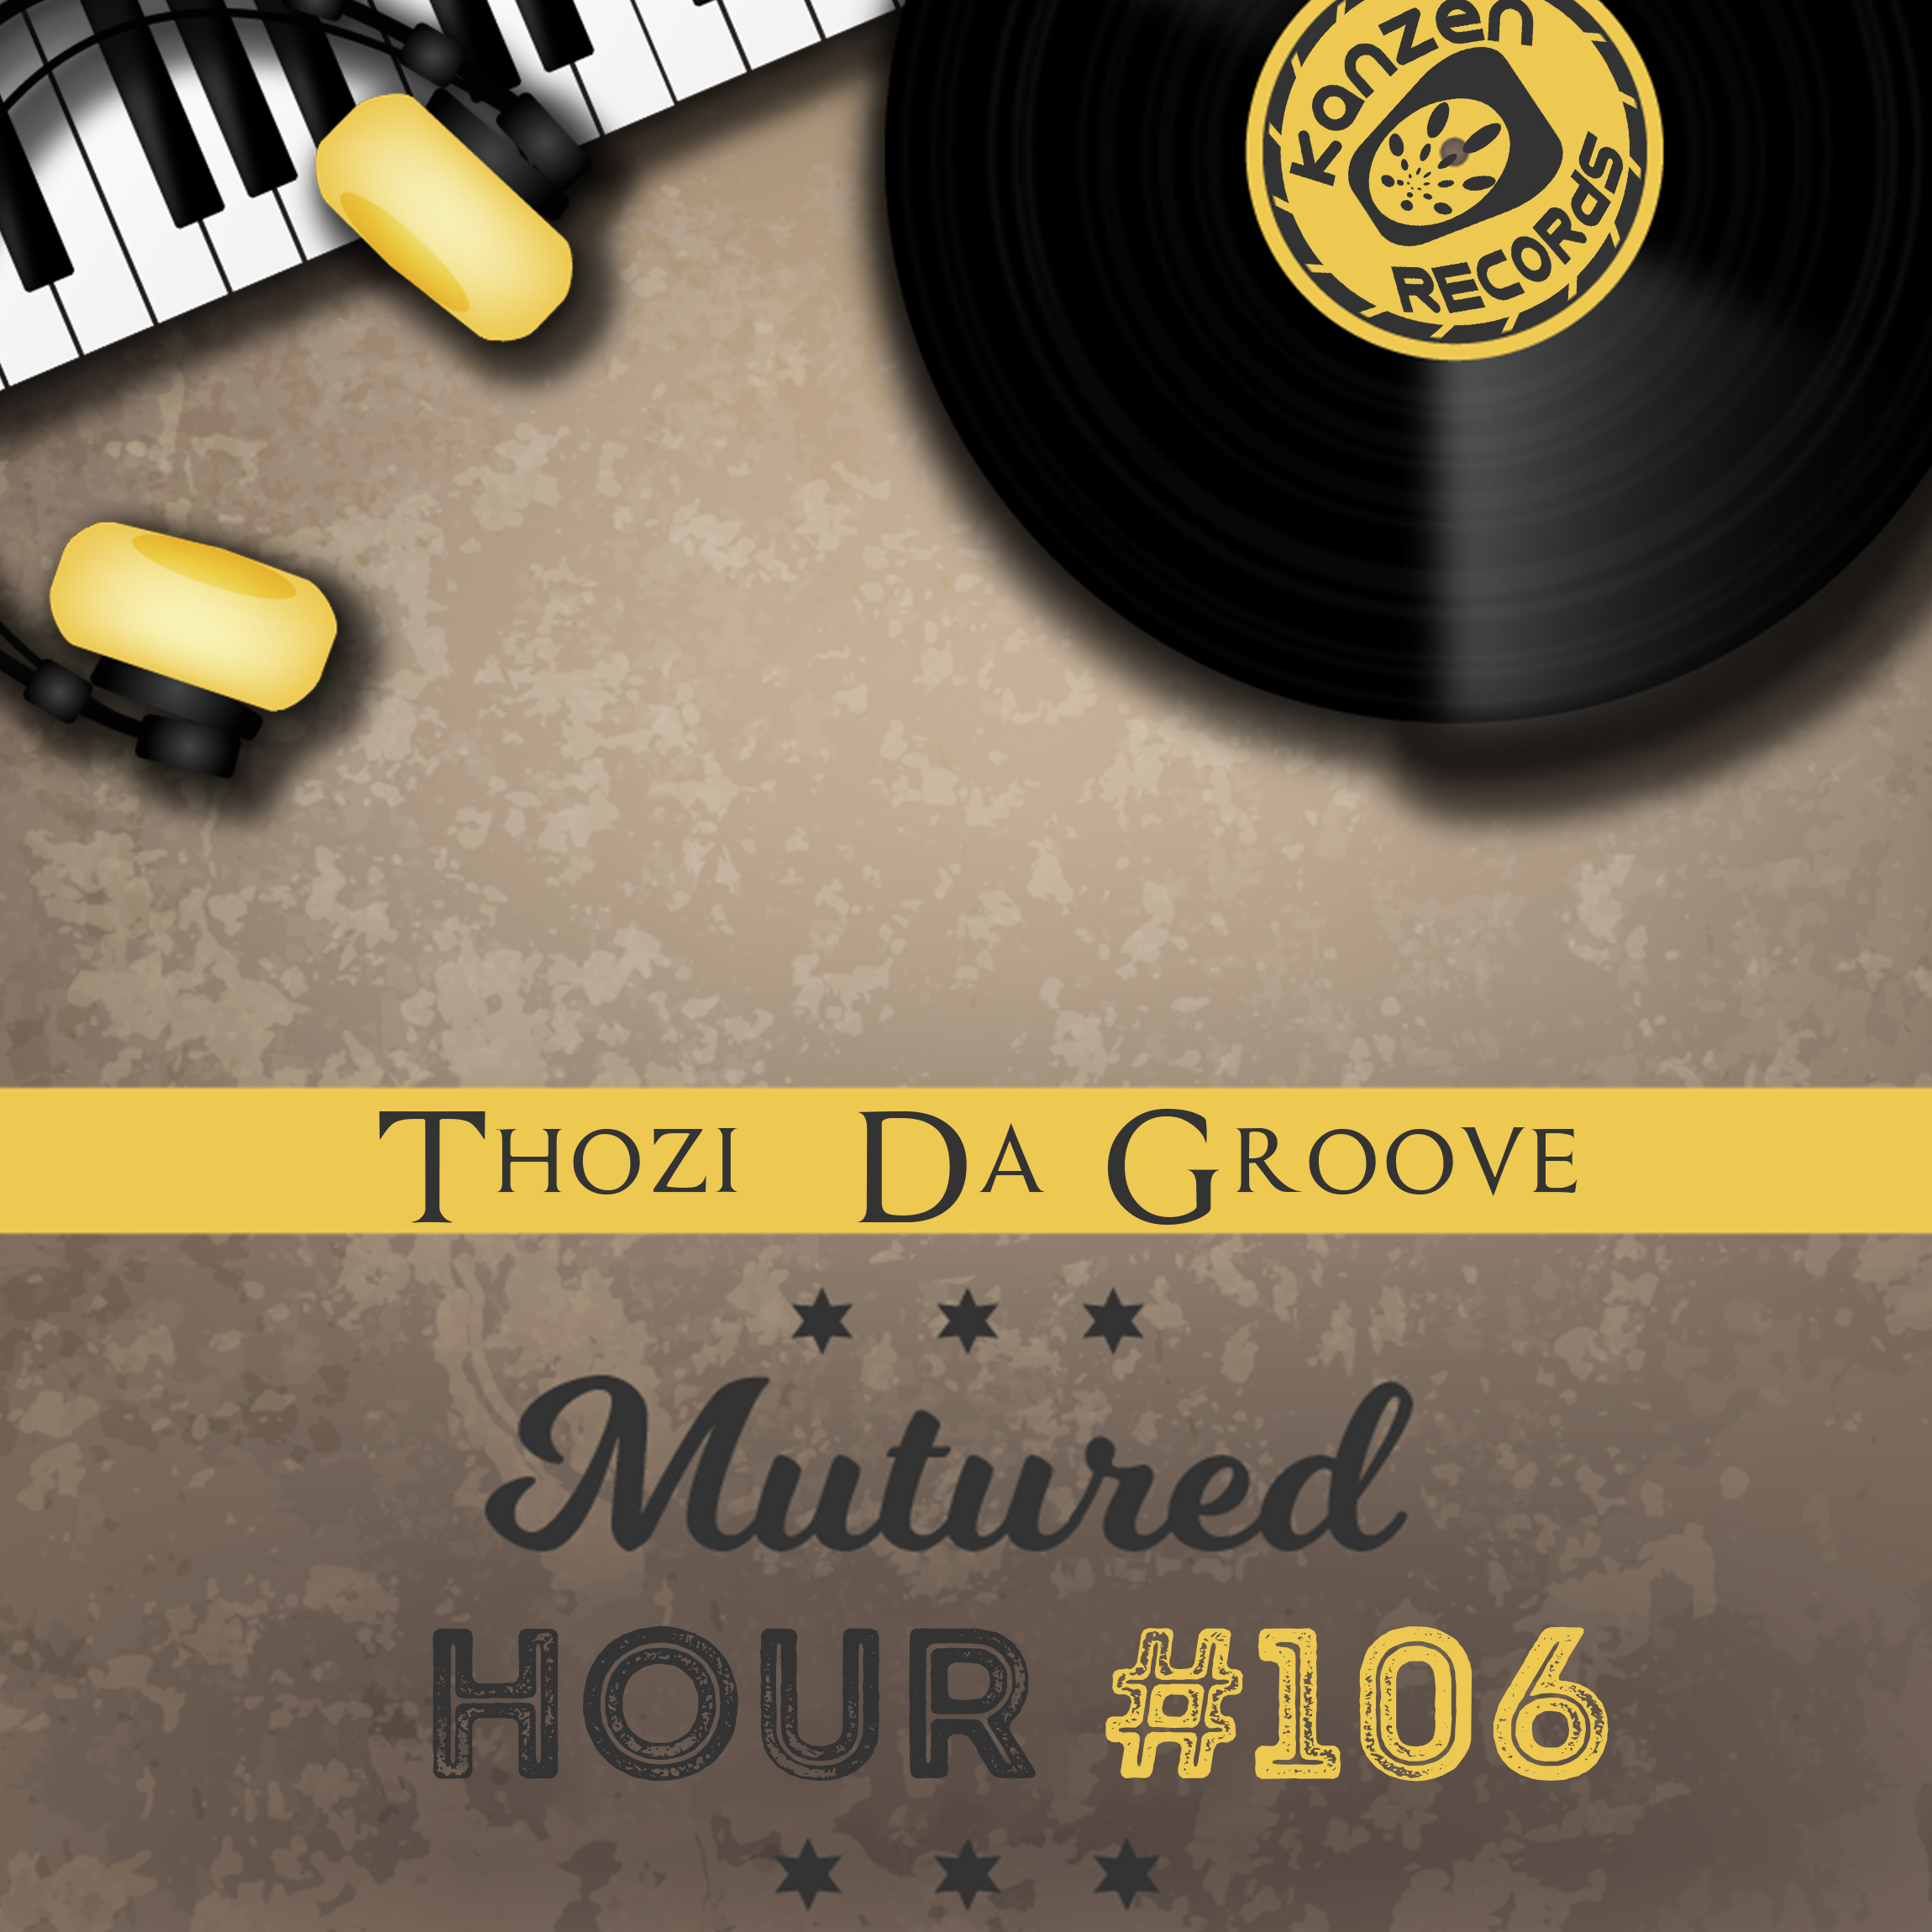 Thozi Da Groove - Matured Hour #106 Image